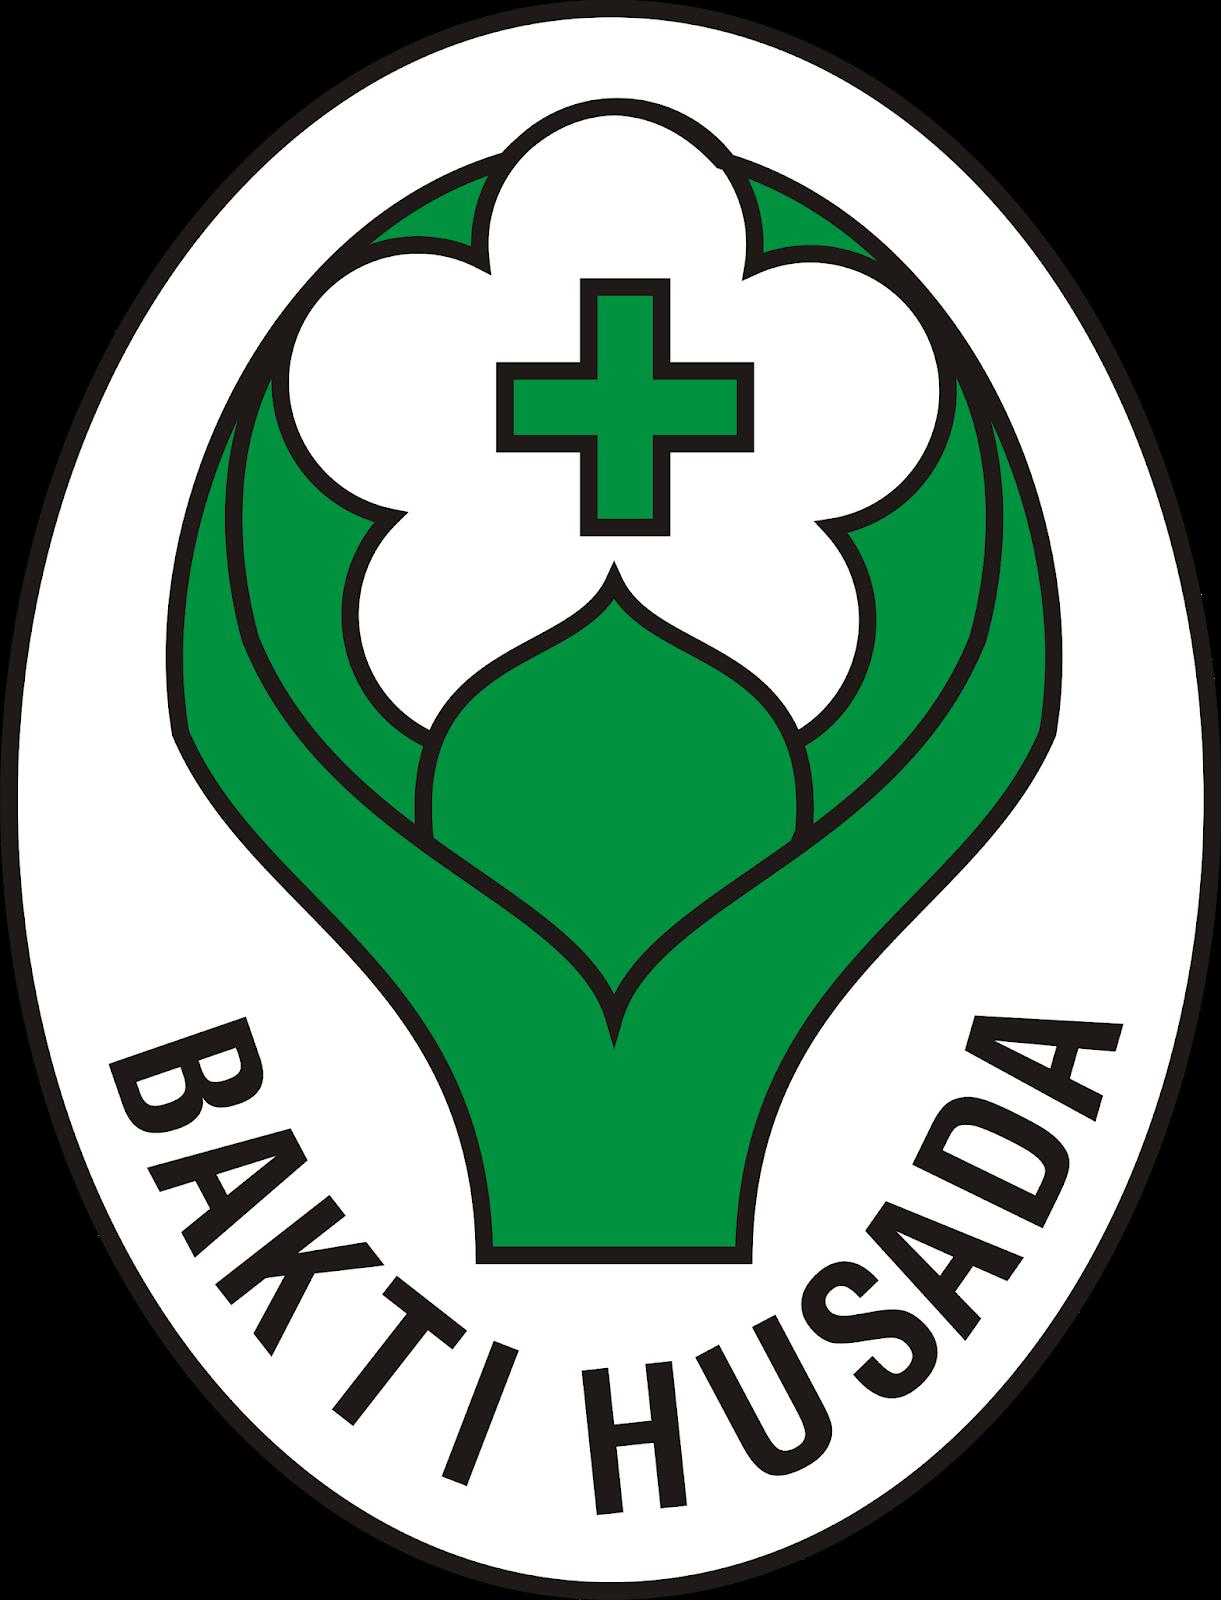 Logo Bakti Husada Png : bakti, husada, Bhakti, Husada